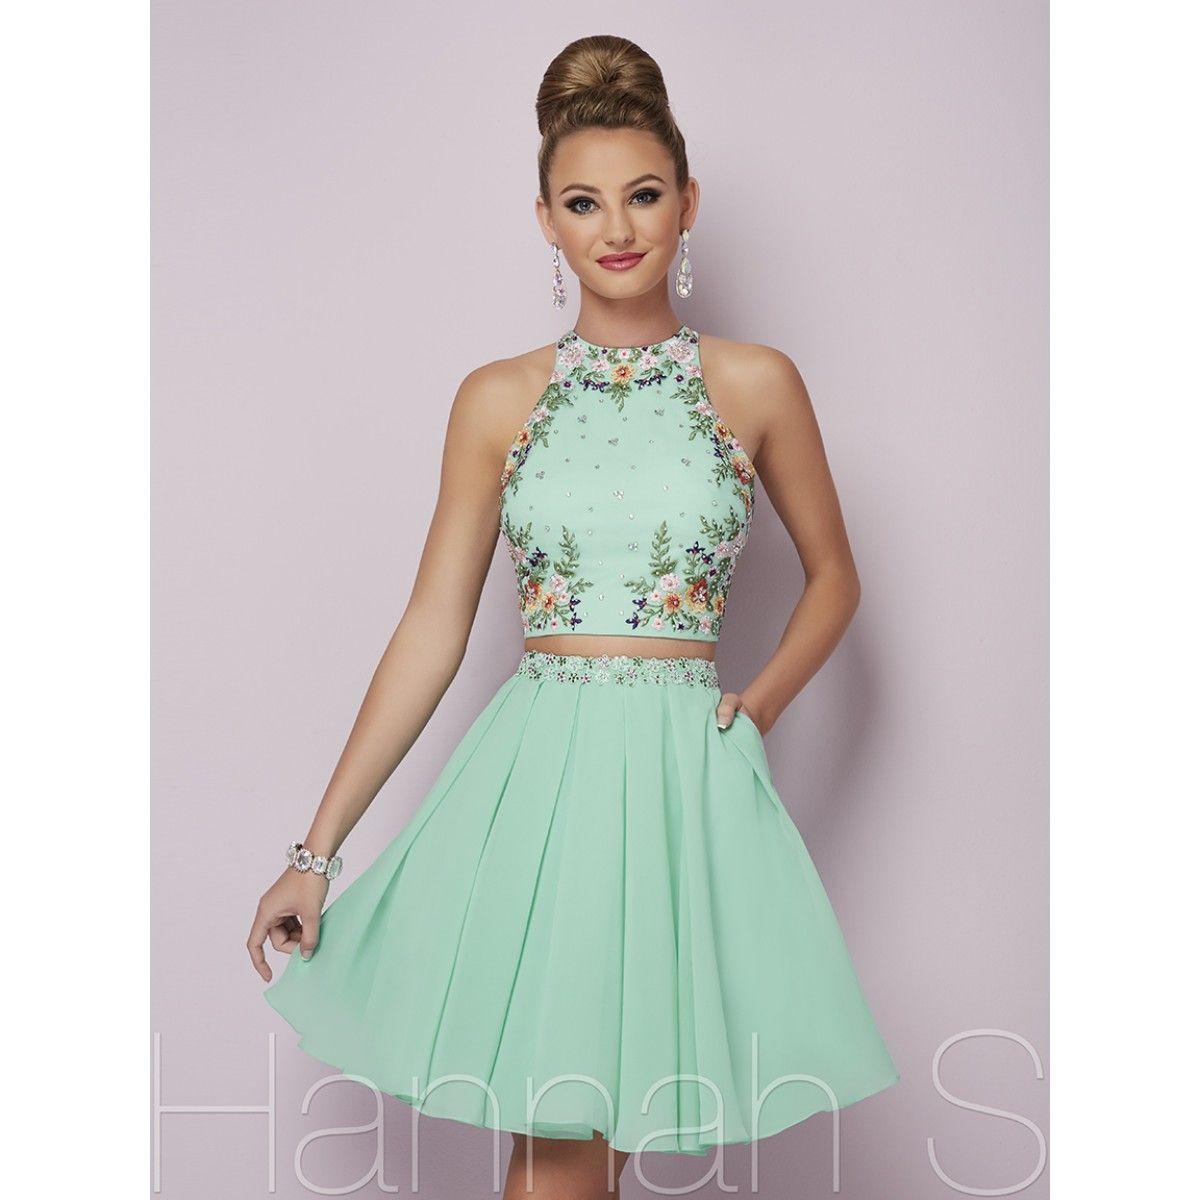 Prom Club Dress Styles Bridal And Formal Inc Two Piece Homecoming Dress Prom Dresses Two Piece Cute Prom Dresses [ 1200 x 1200 Pixel ]